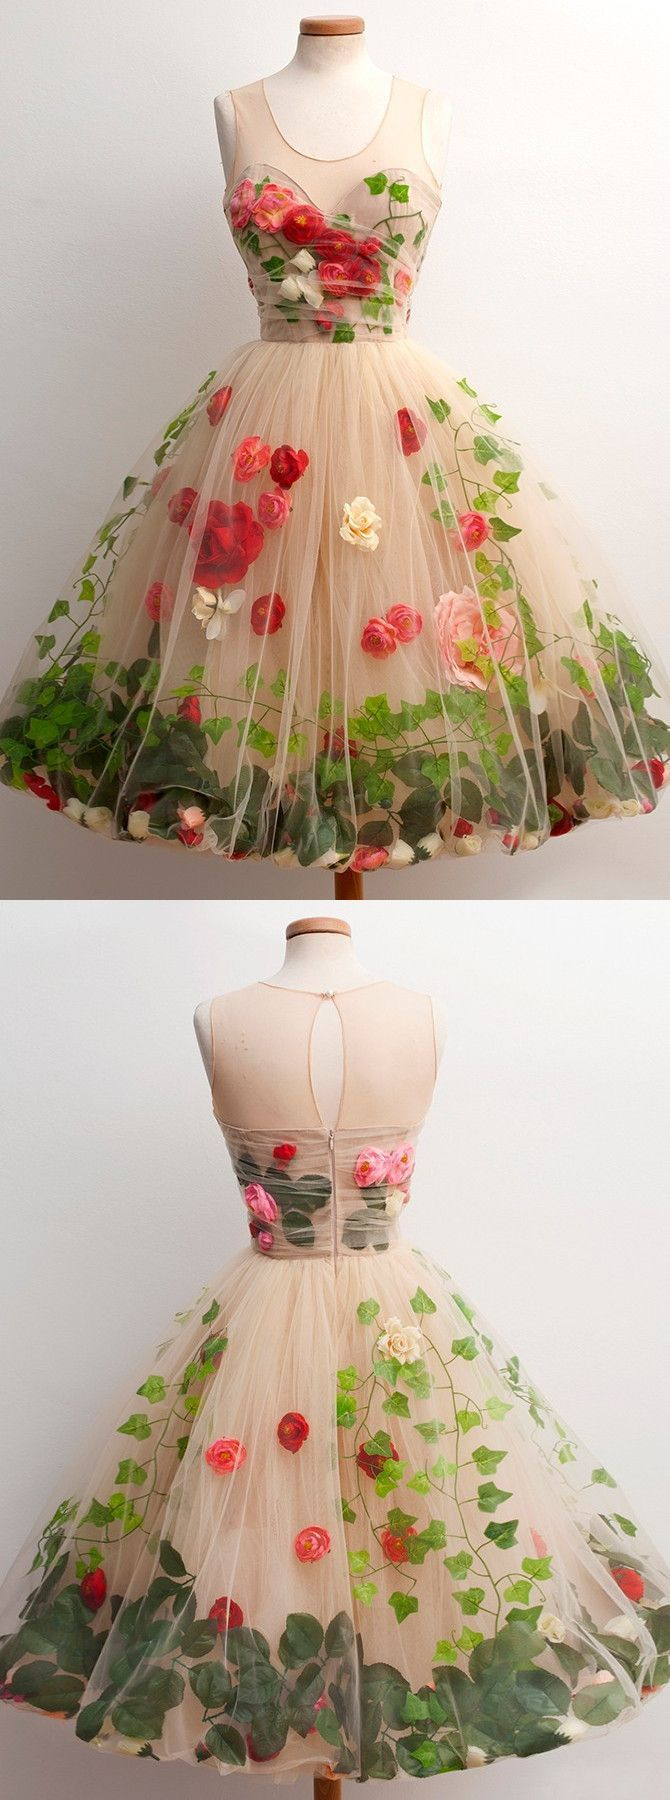 2017 homecoming dresses,unique homecoming dresses,champagne homecoming dresses,tulle homecoming dresses @simpledress2480 #nightoutifparty